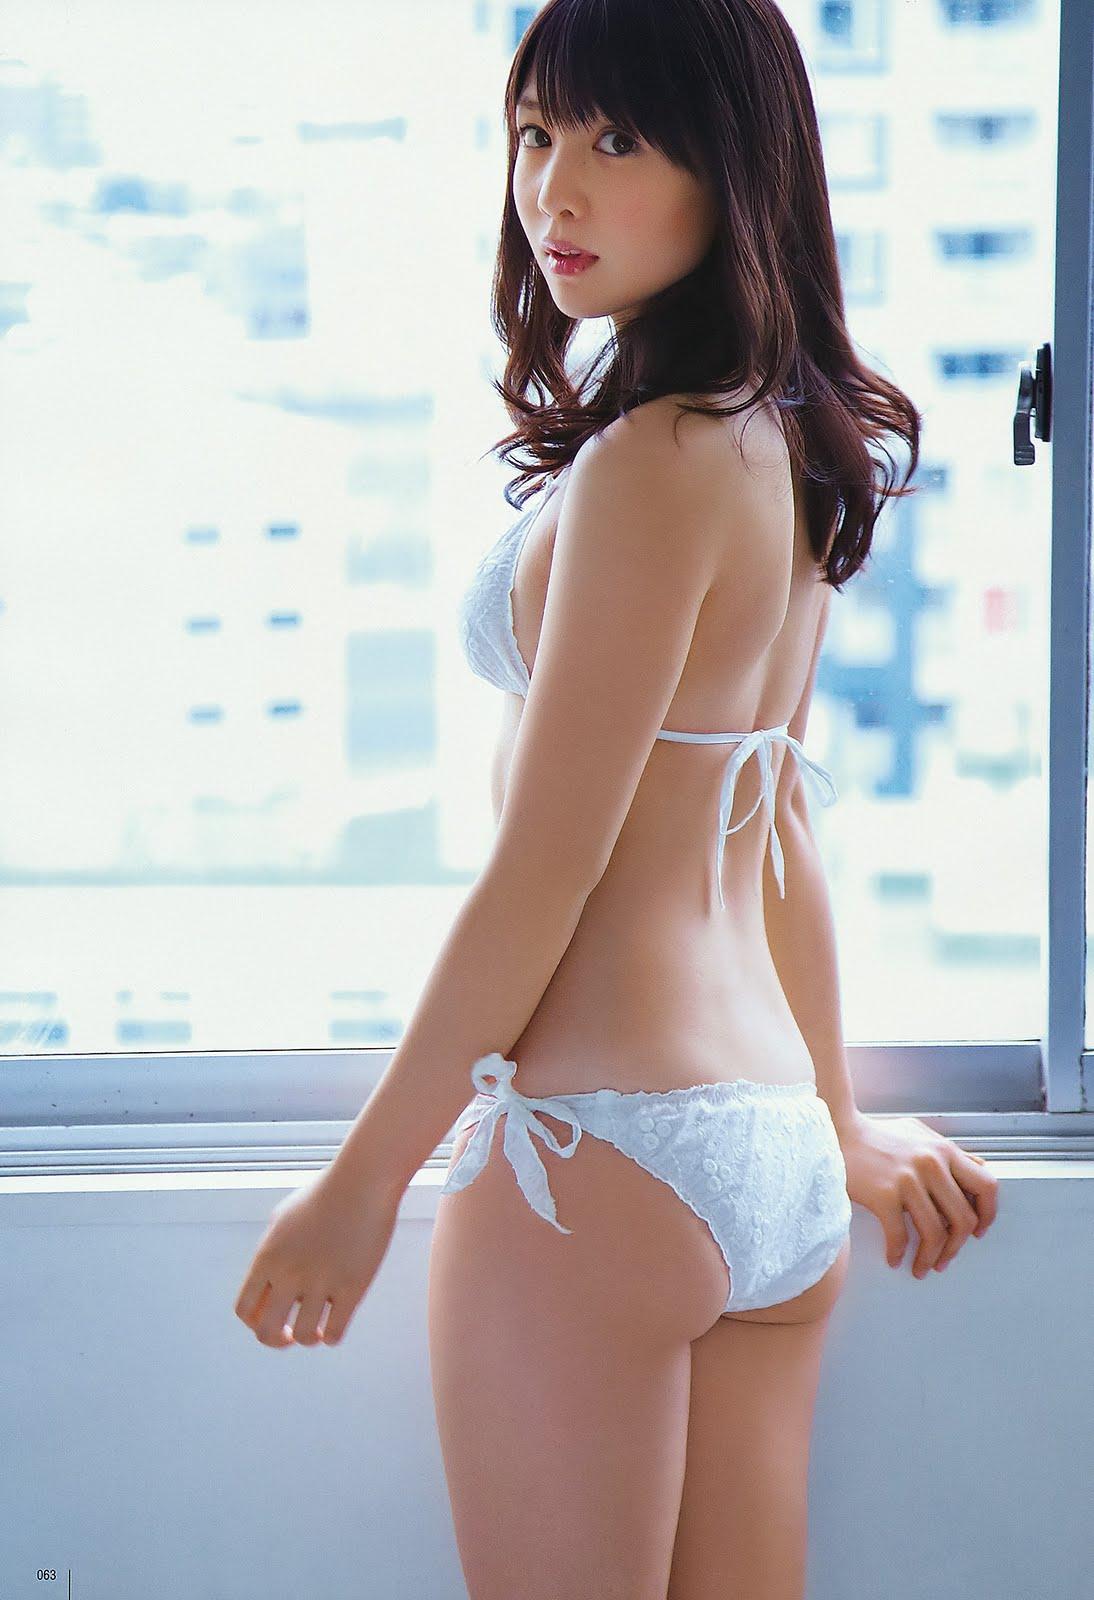 Yui Koike - Alchetron, The Free Social Encyclopedia